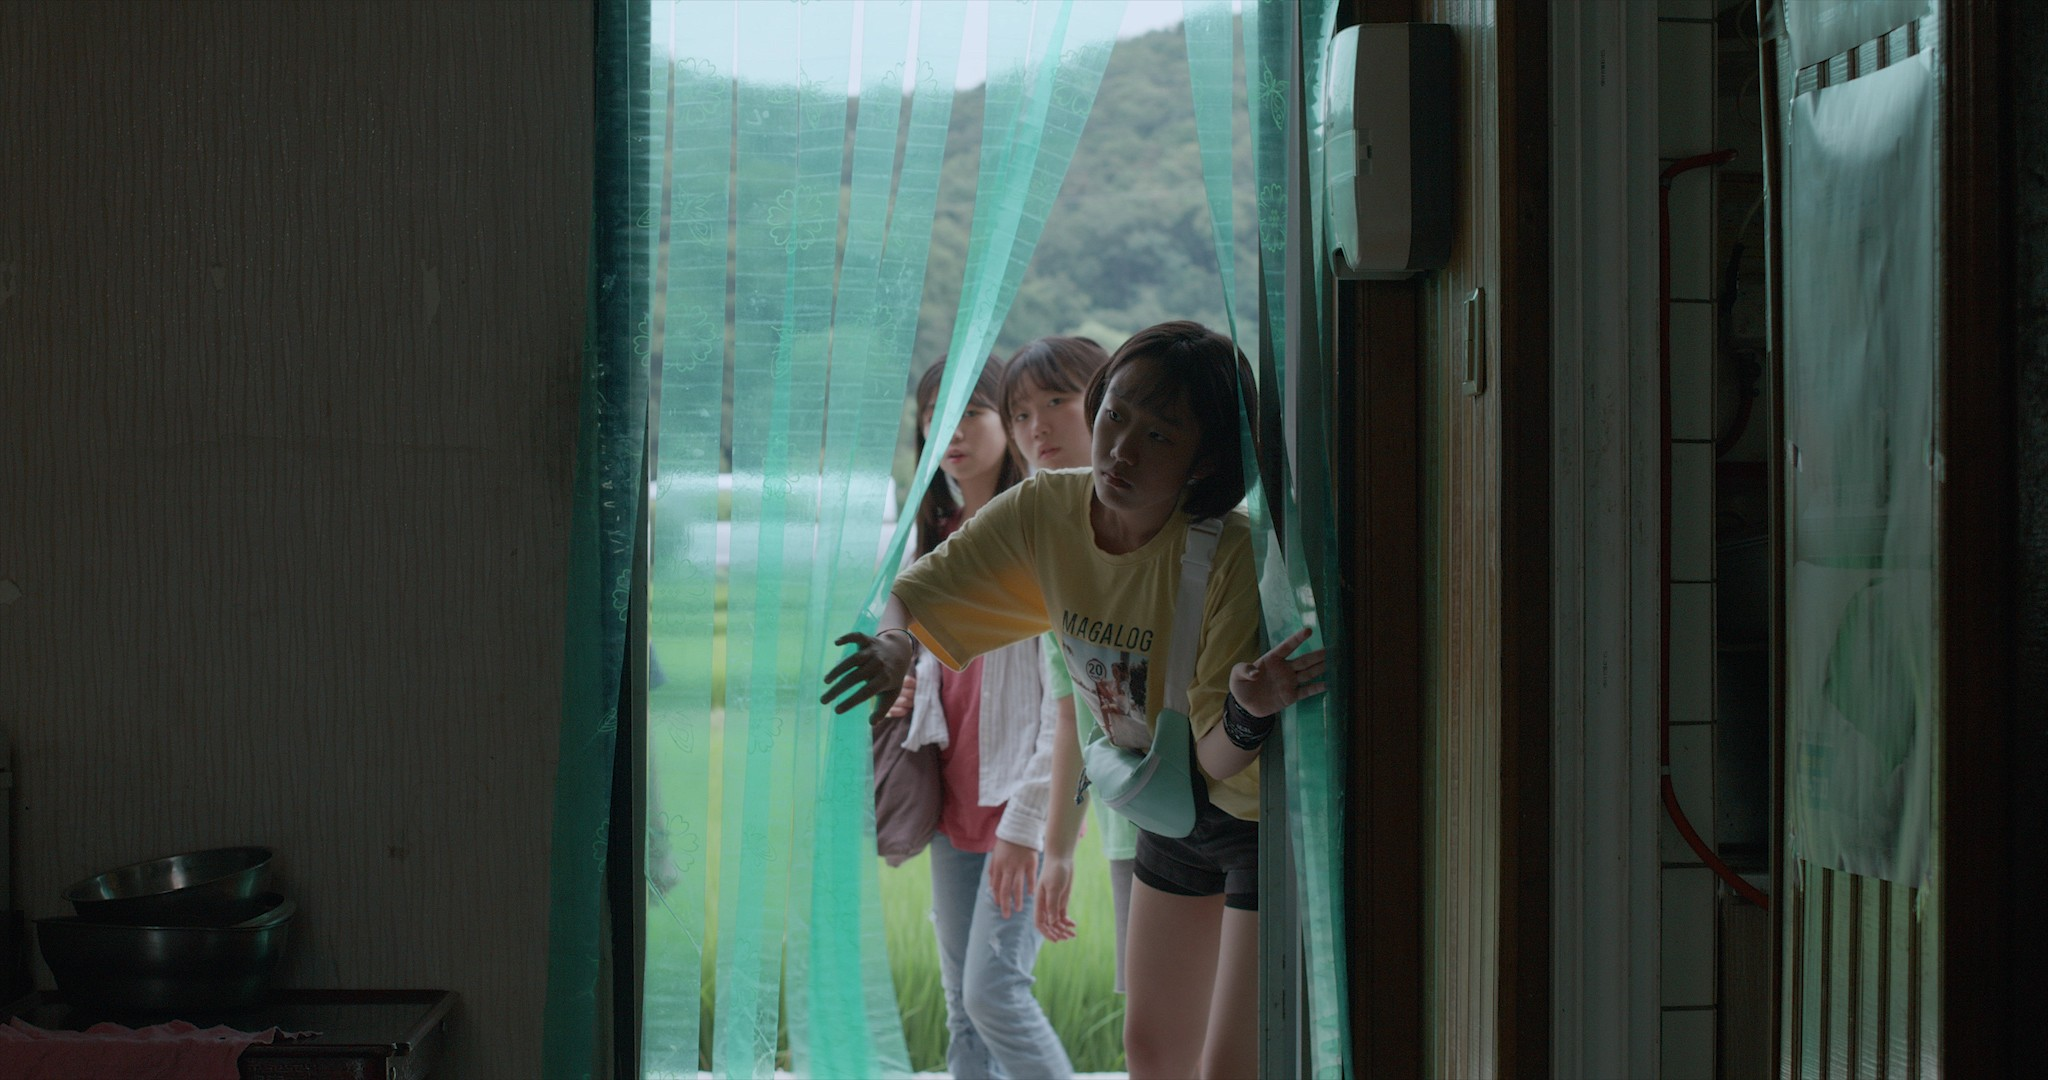 Seol Si-yeon, Park So-jung, Bae Yeon-woo in Jong chak yeok | Short Vacation | Bis ans Ende der Welt by Kwon Min-pyo, Seo Hansol | KOR 2020, Generation | © Tiger Cinema & DGC